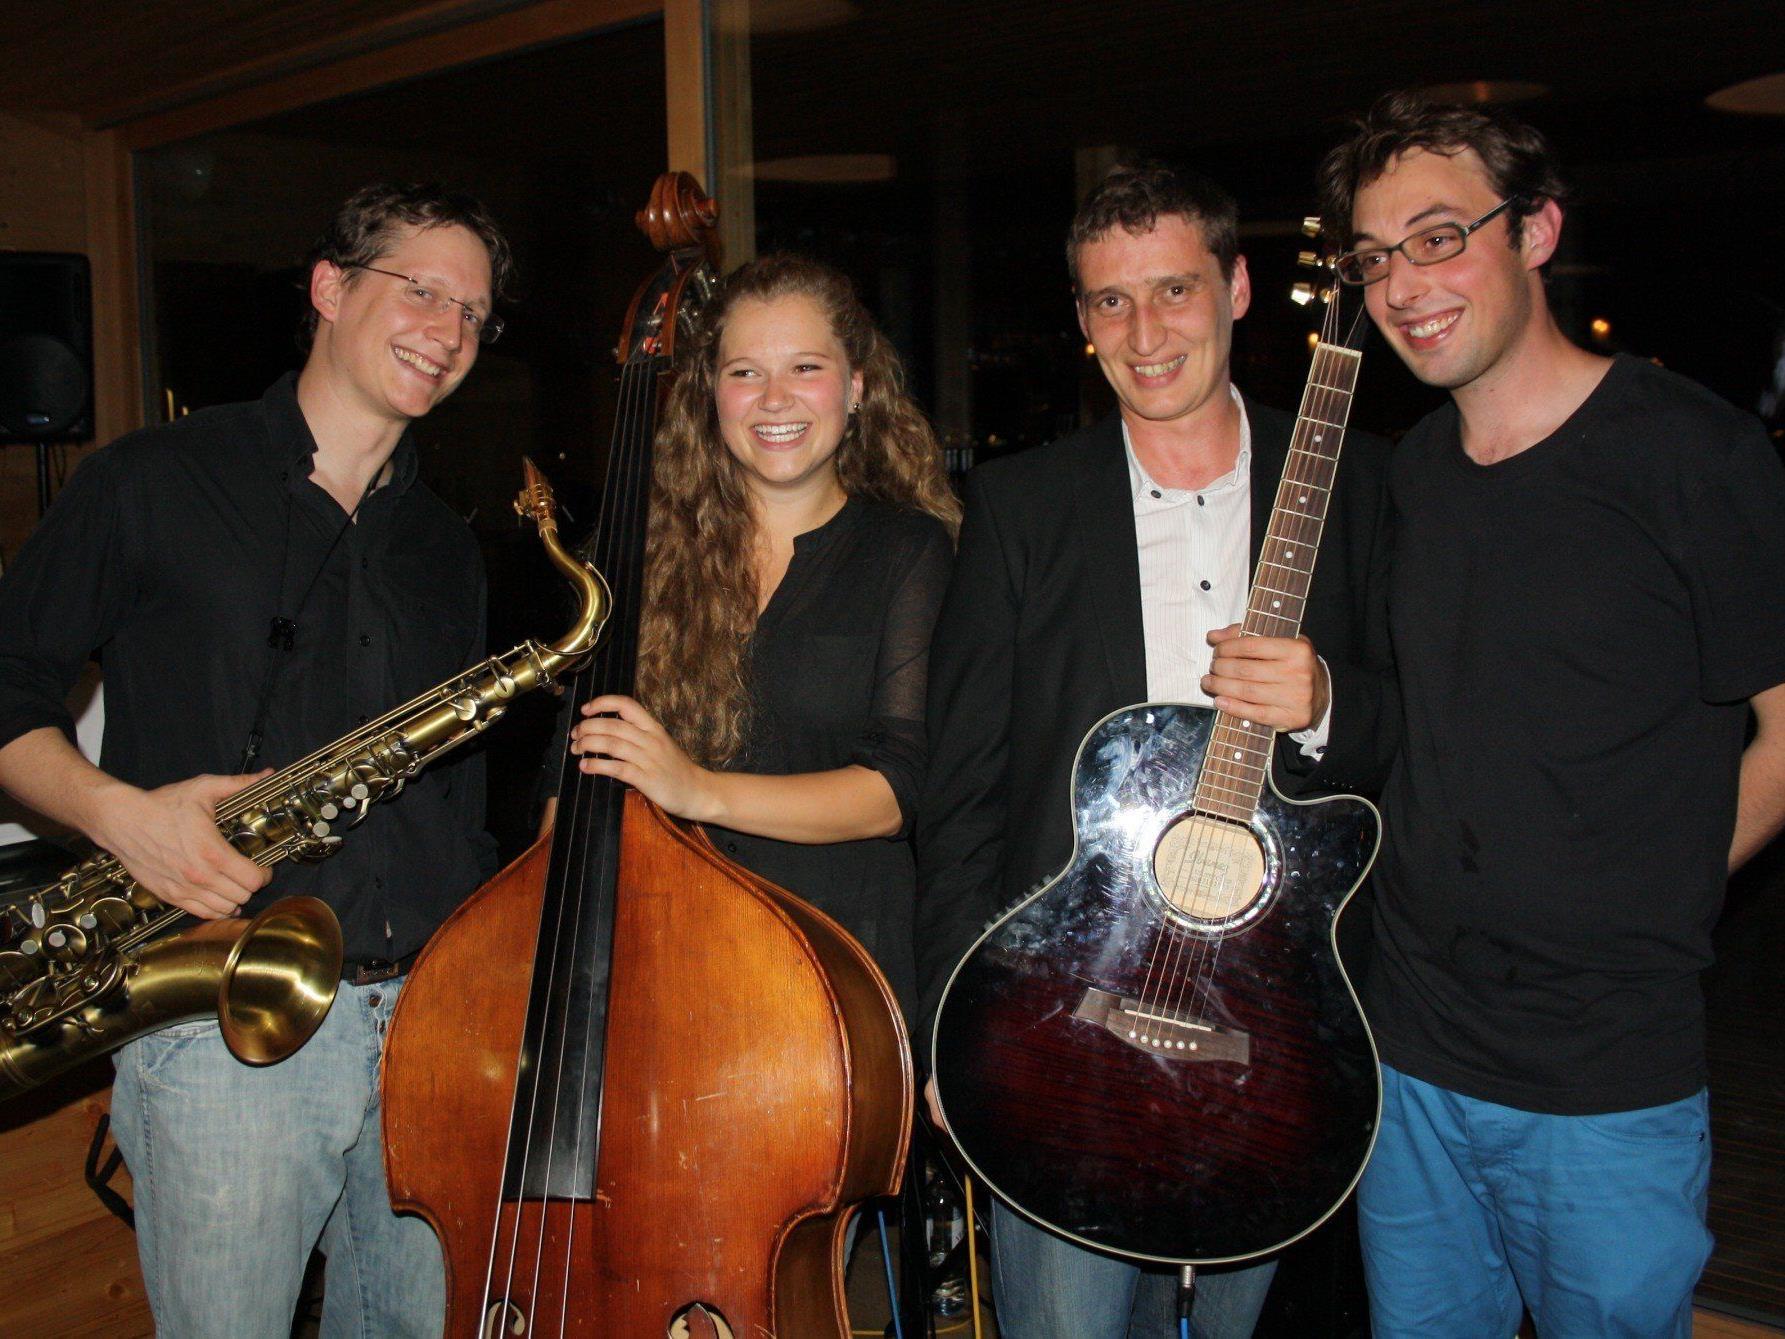 """mrs. moon"" aus Tirol mit Gerold Huber (Saxophon/Percussion), Anna Volderauer (Kontrabass), Philipp Schmid (Gitarre/Gesang), Daniel Öttl (Keyboard), von links."